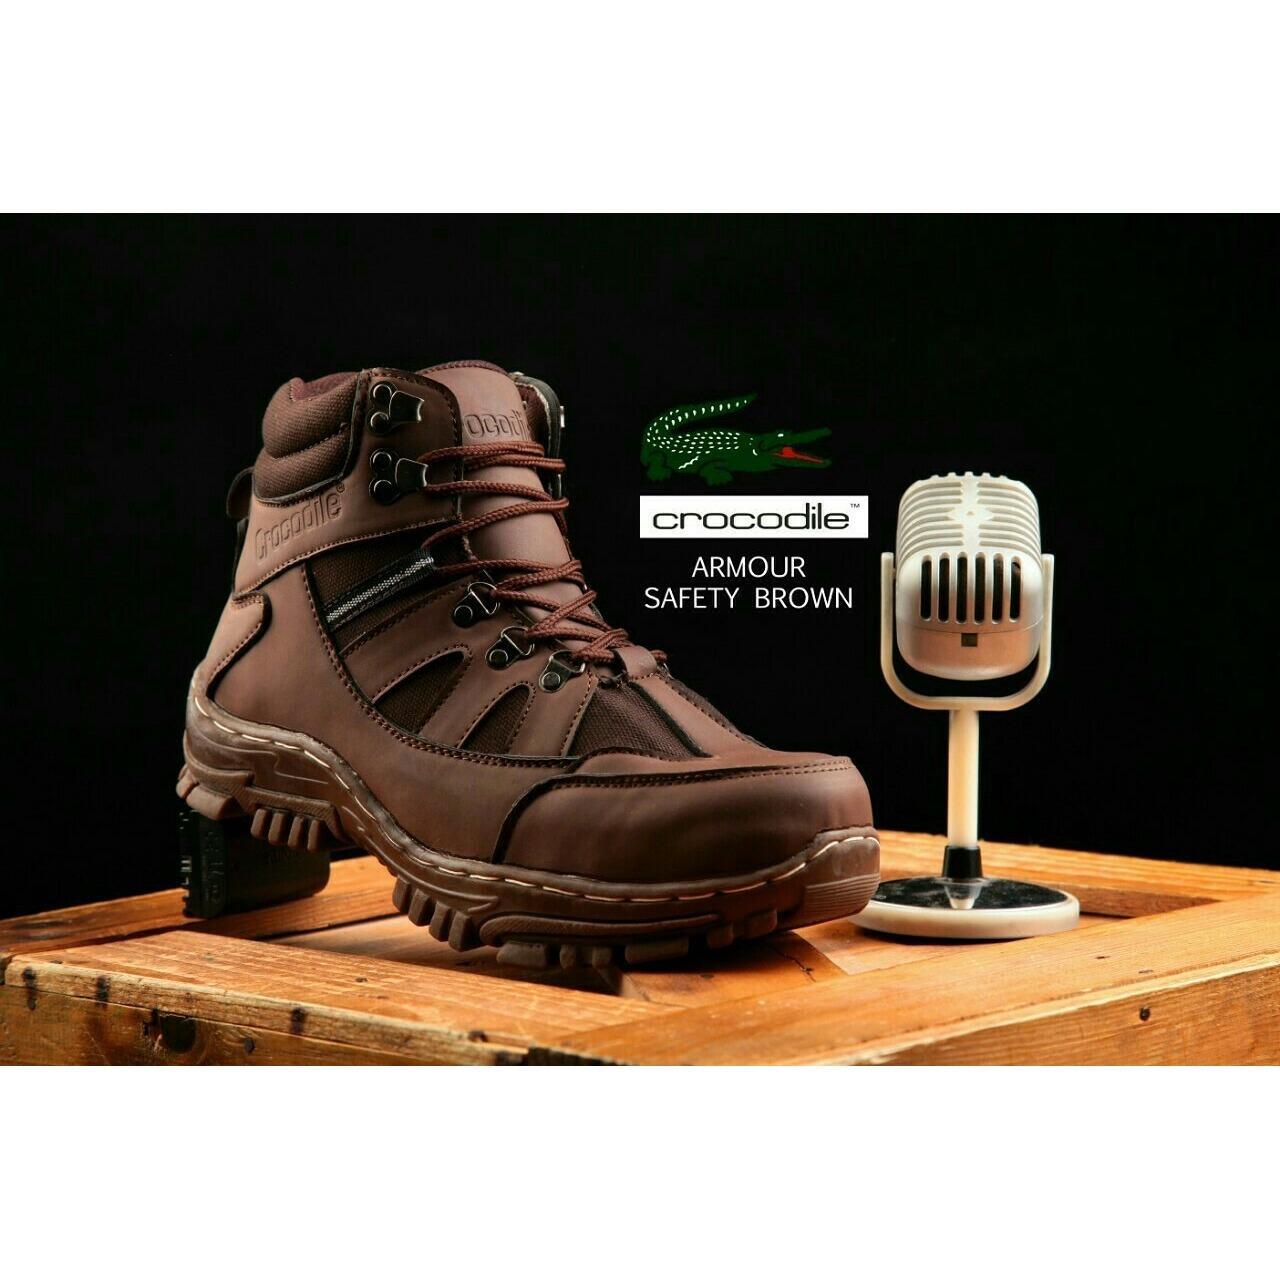 Dbest Kudastore Sepatu Boots Docmart Pria 8 Lubang - Hitam. Source · Jual Boots Pria